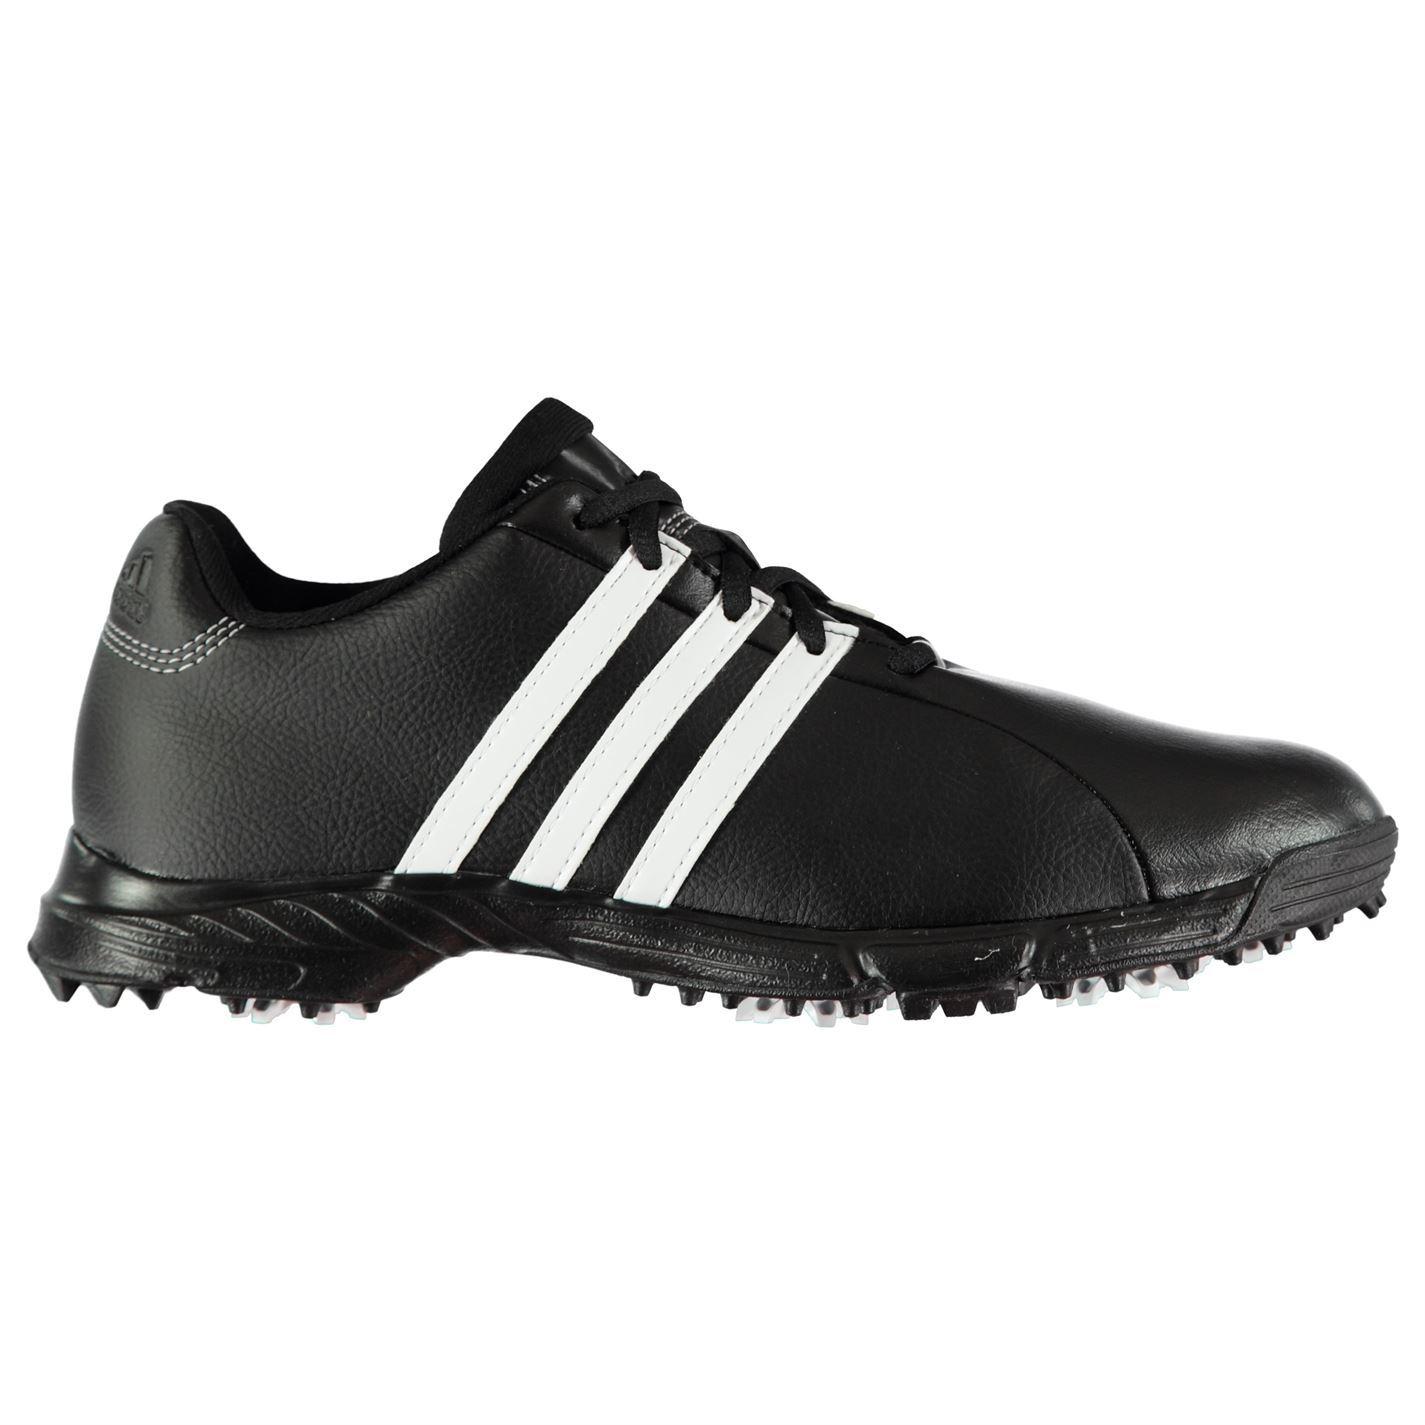 adidas-Golflite-Golf-Shoes-Mens-Spikes-Footwear thumbnail 11